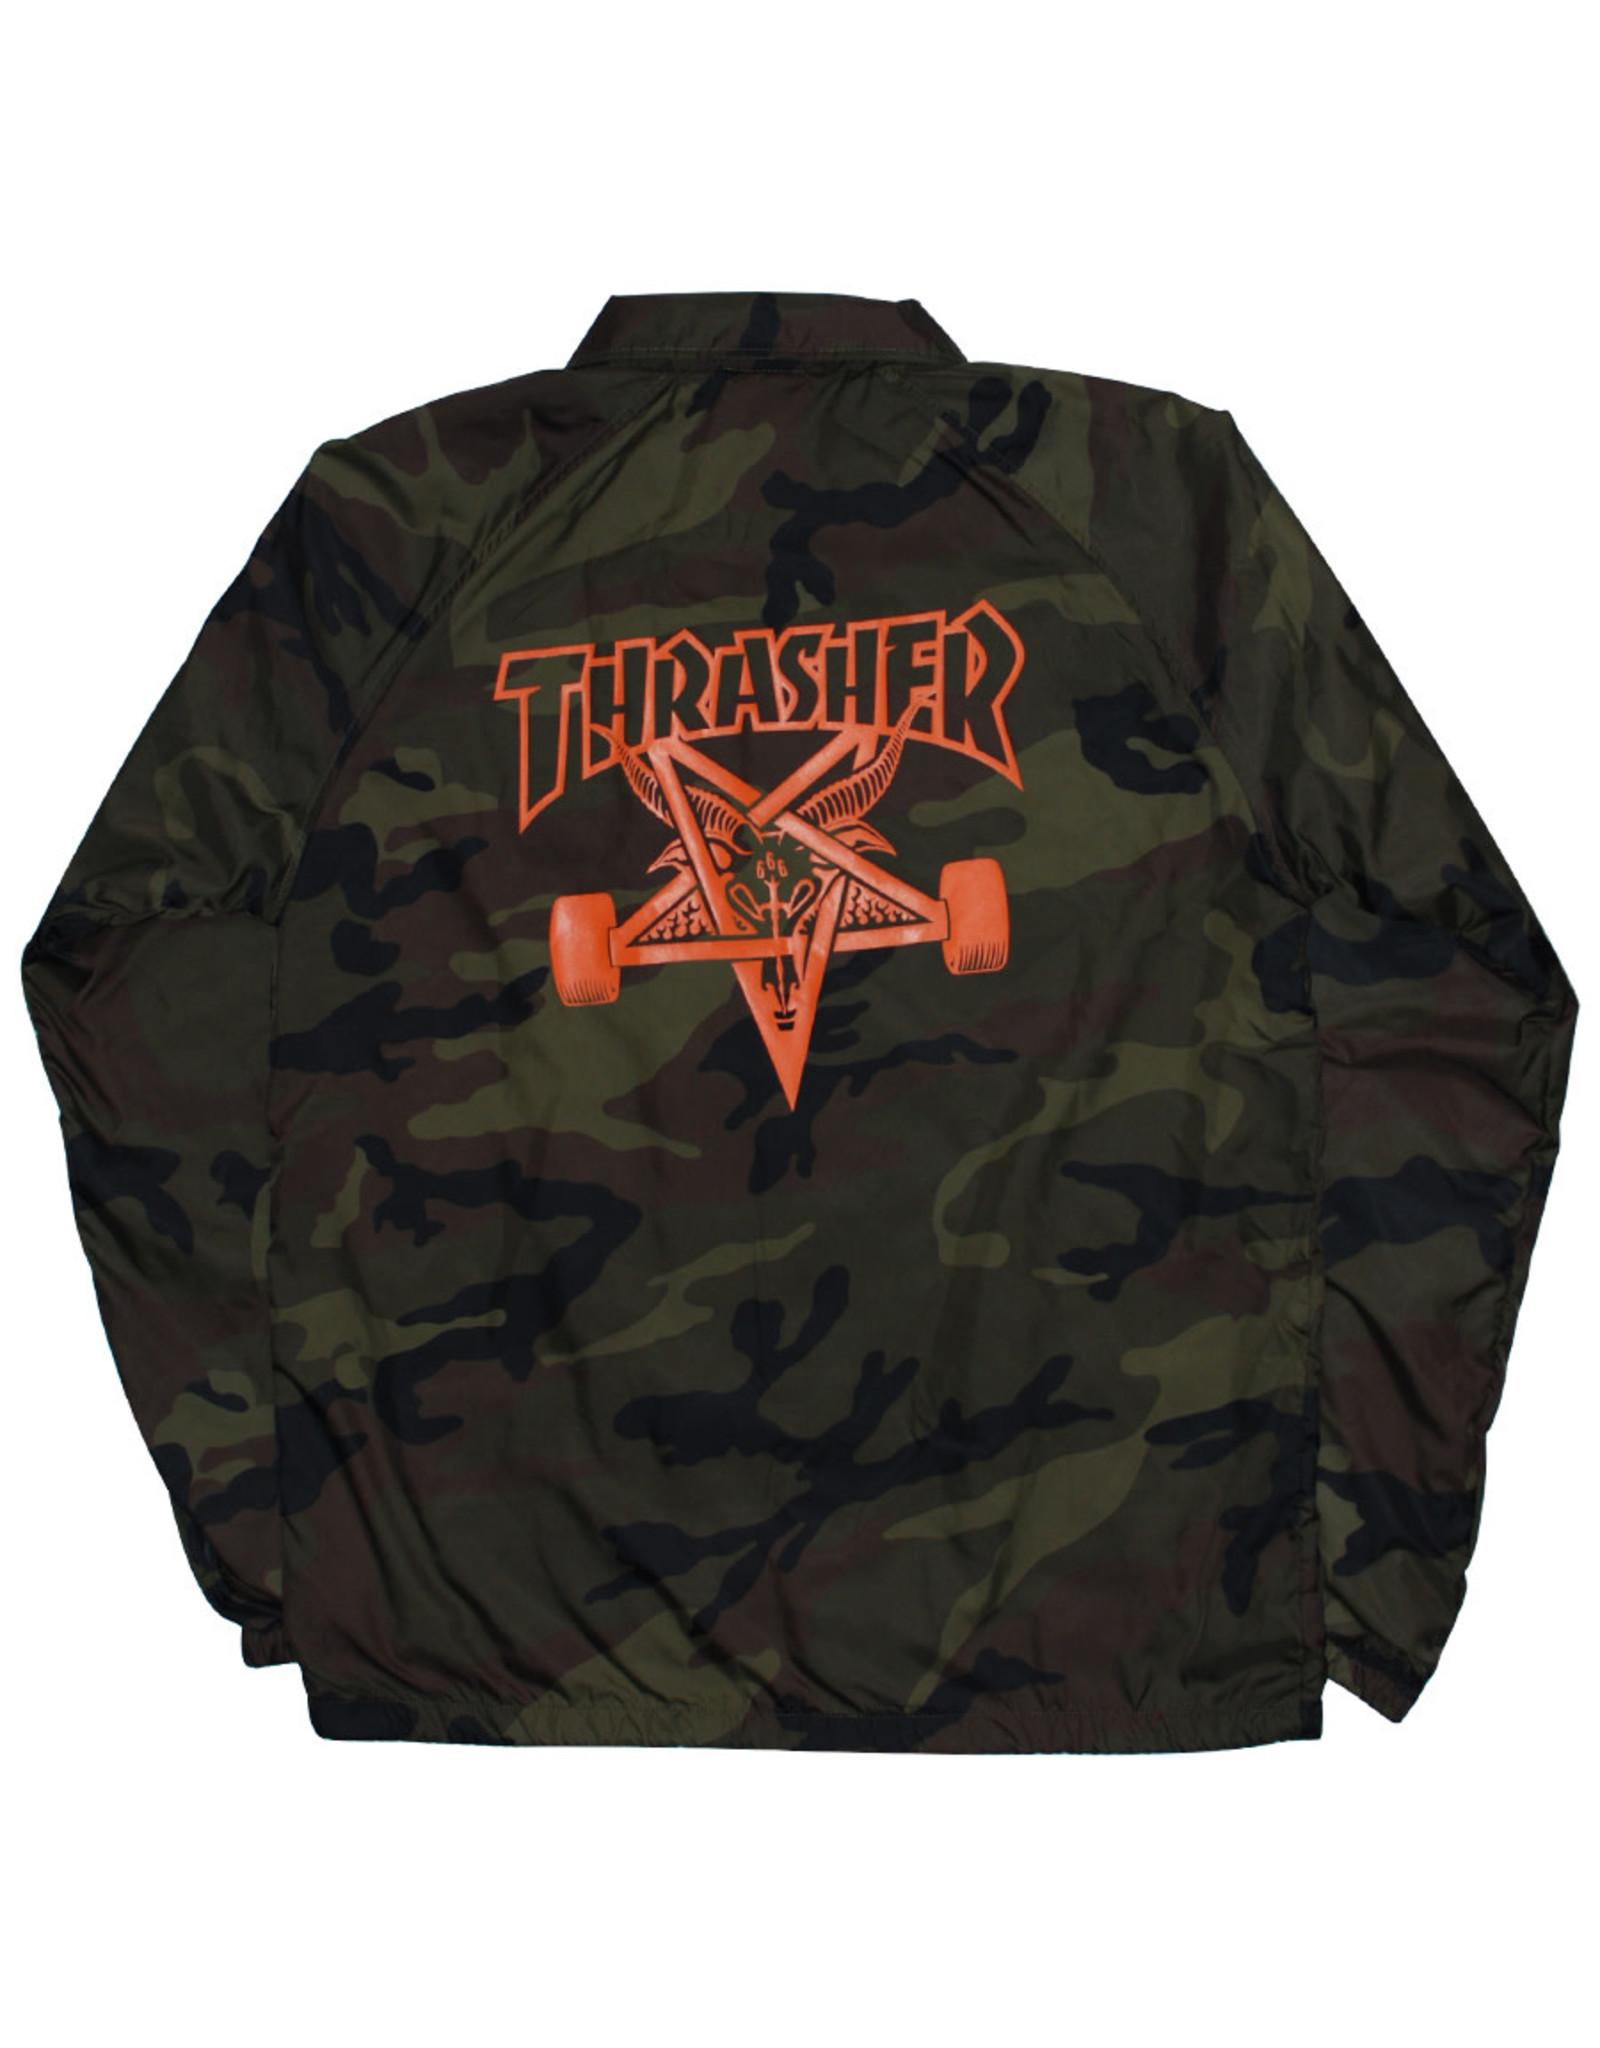 Thrasher Thrasher Jacket Mens Sk8 Goat Coach (Camo)